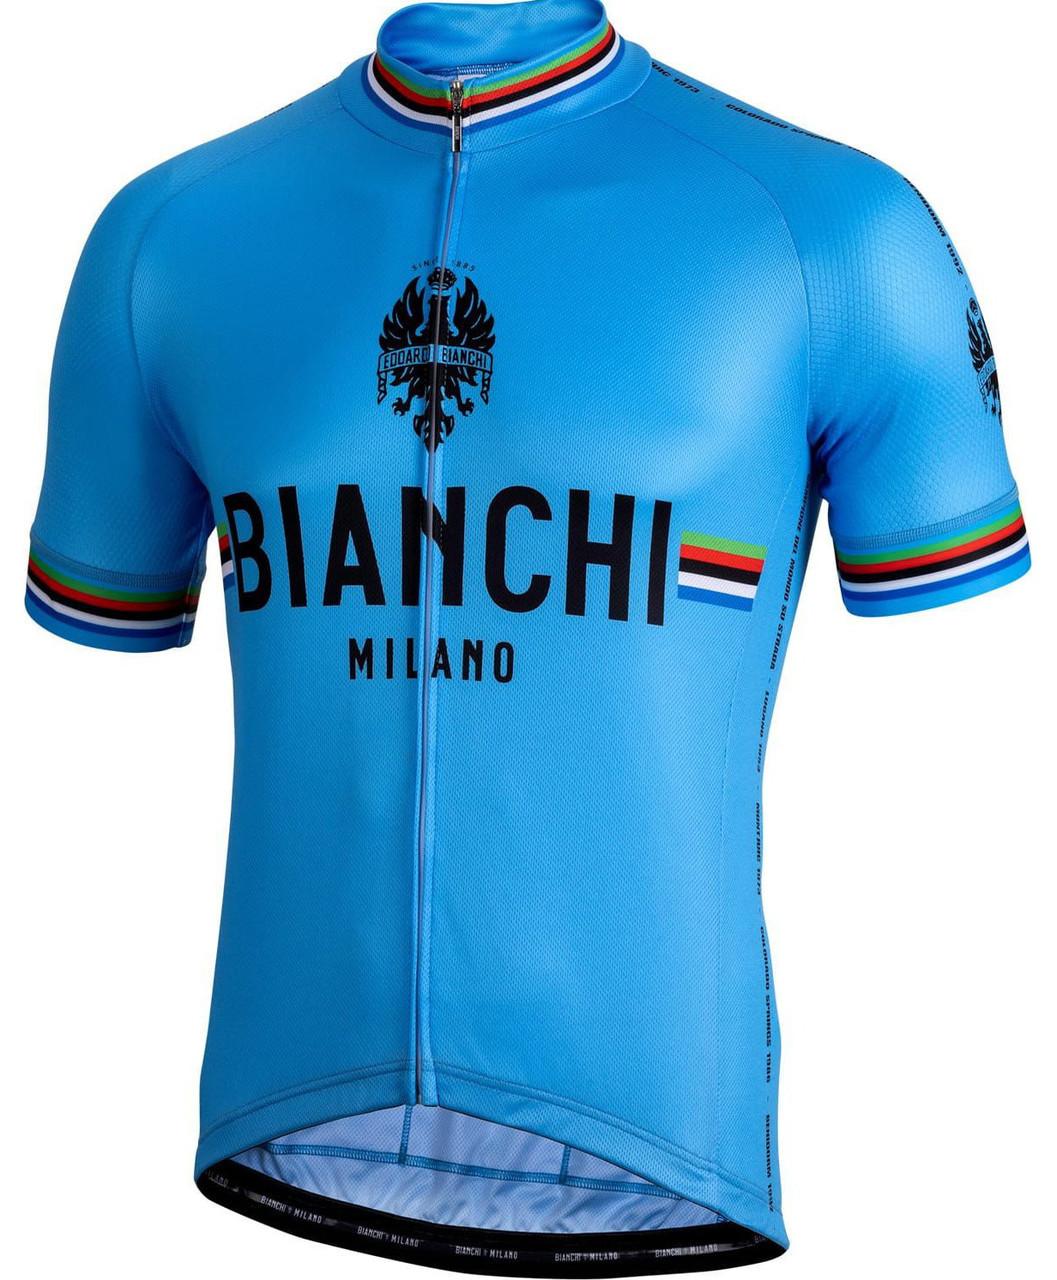 Bianchi Milano New Pride Blue Jersey